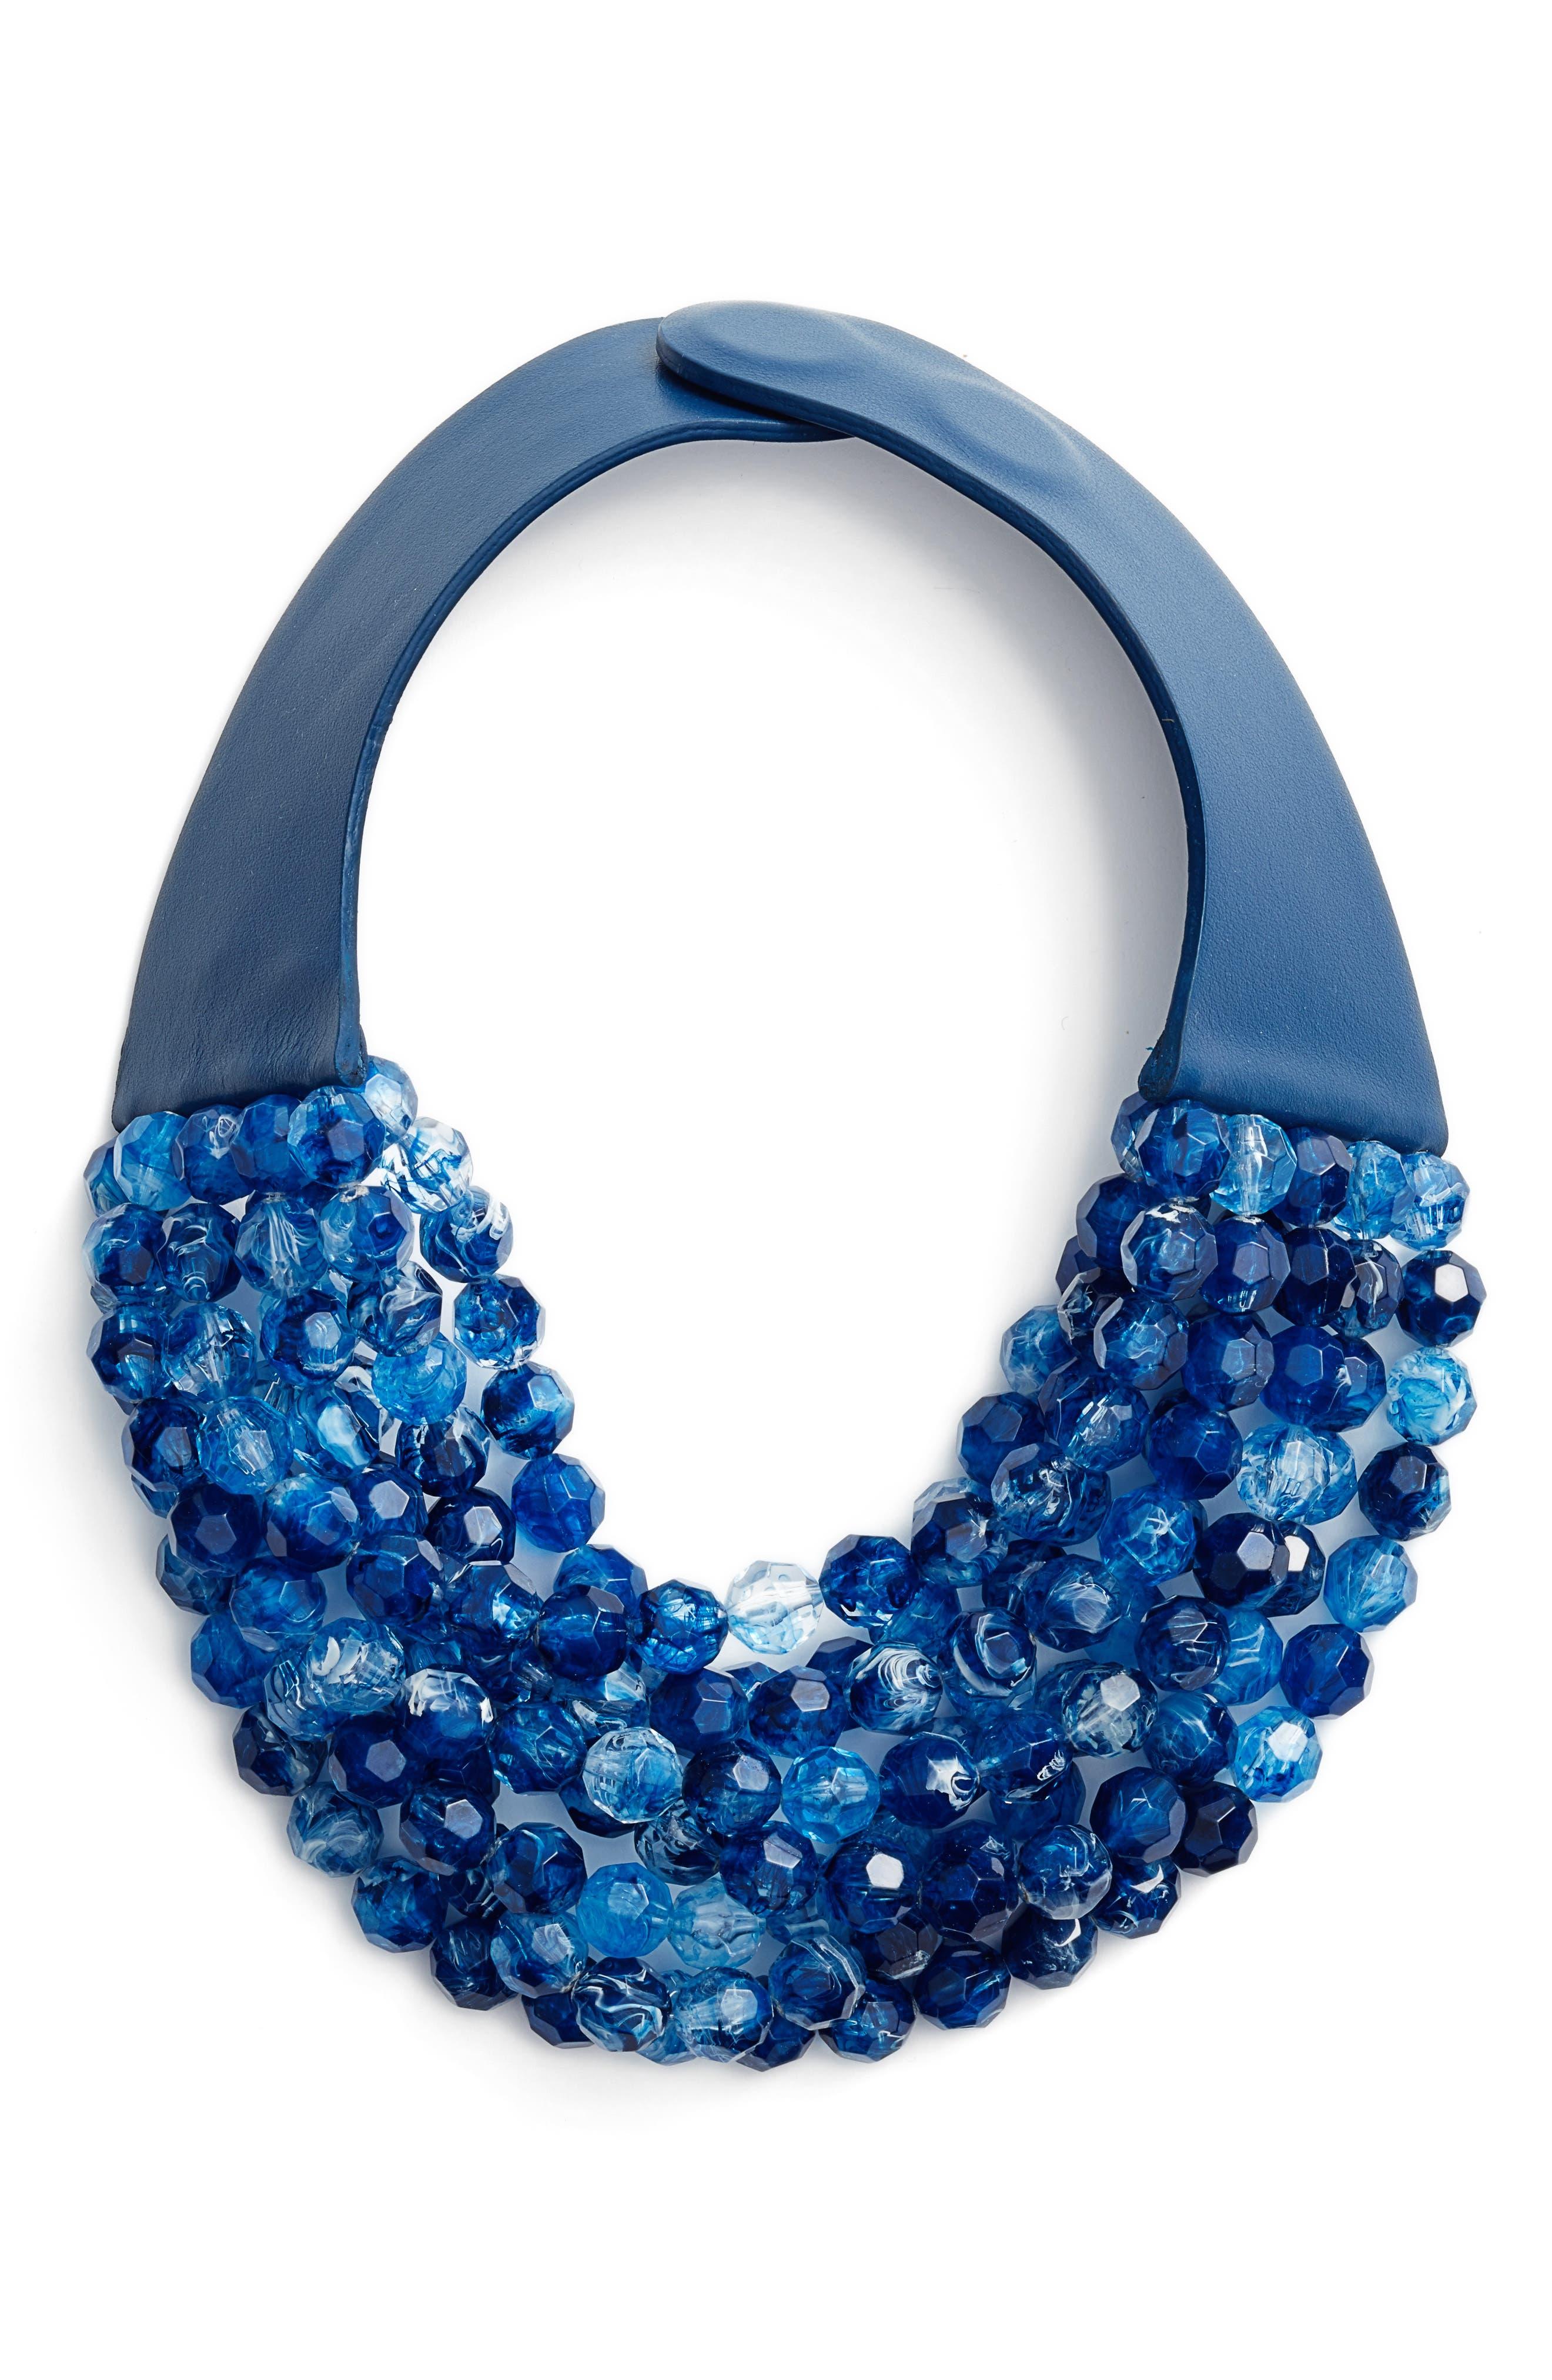 Alternate Image 1 Selected - Fairchild Baldwin Bella Beaded Collar Necklace